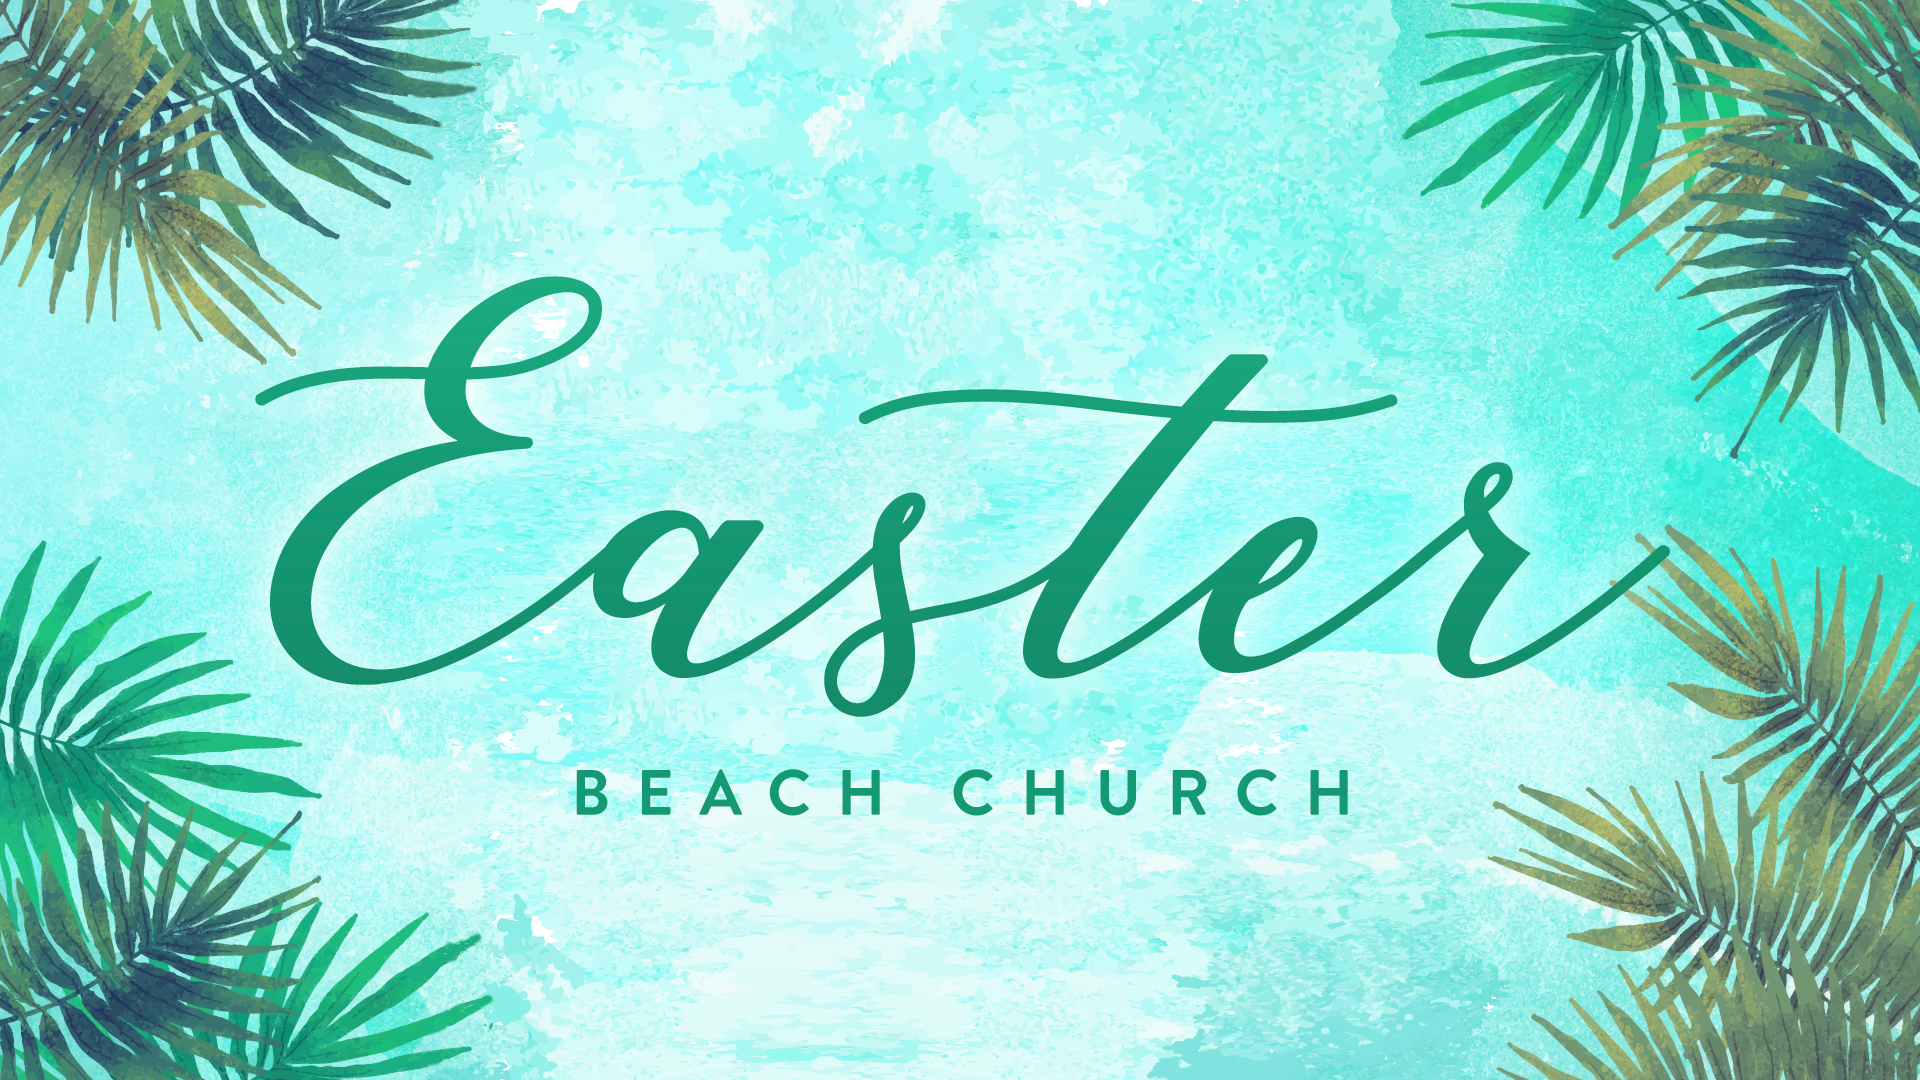 EasterBeach_1920x1080.jpg